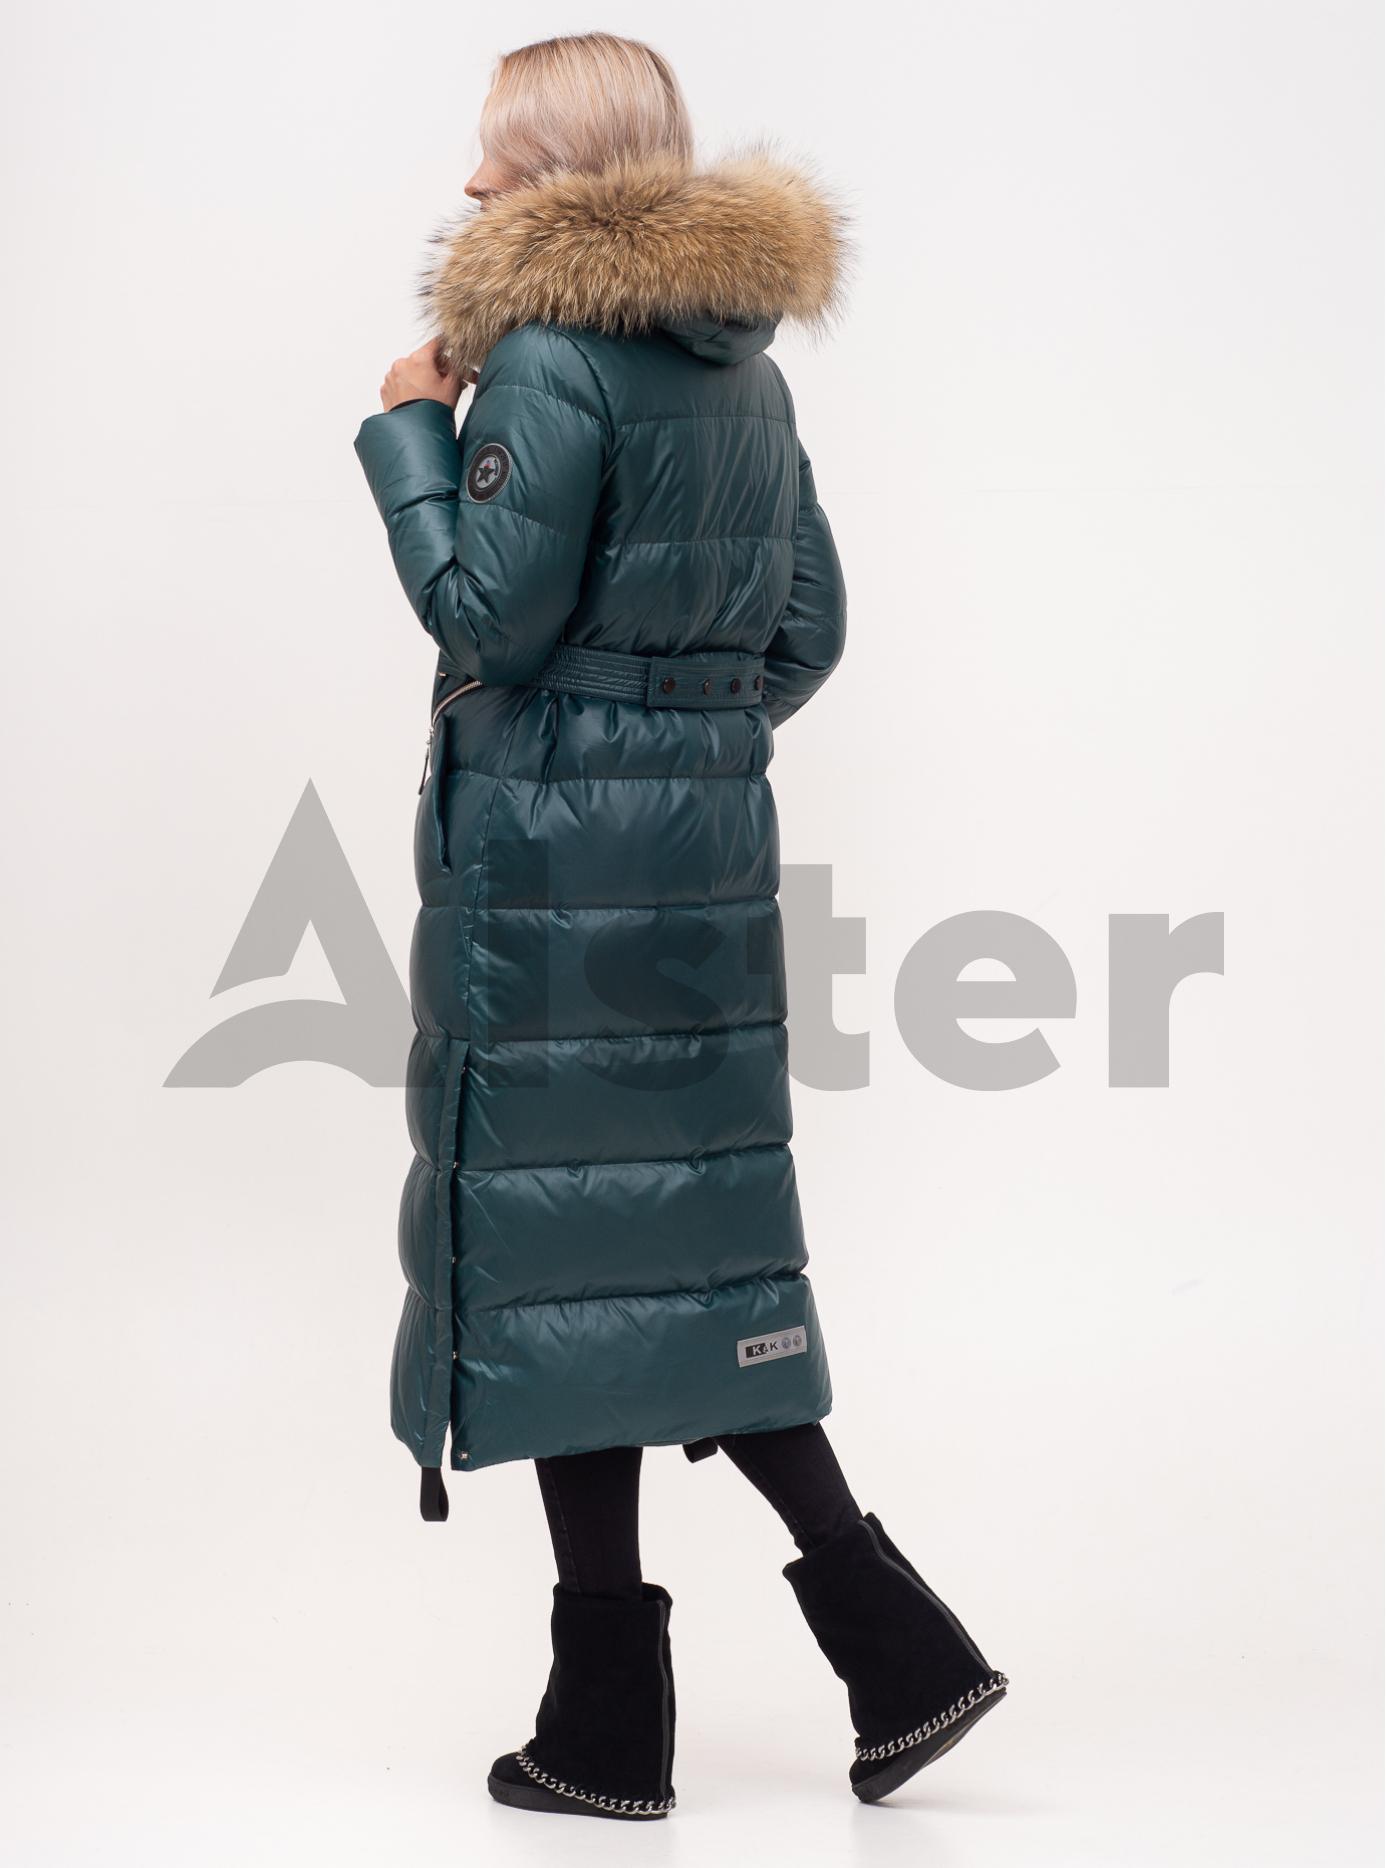 Пуховик зимний длинный на молнии с мехом енота Изумруд S (01-N200457): фото - Alster.ua